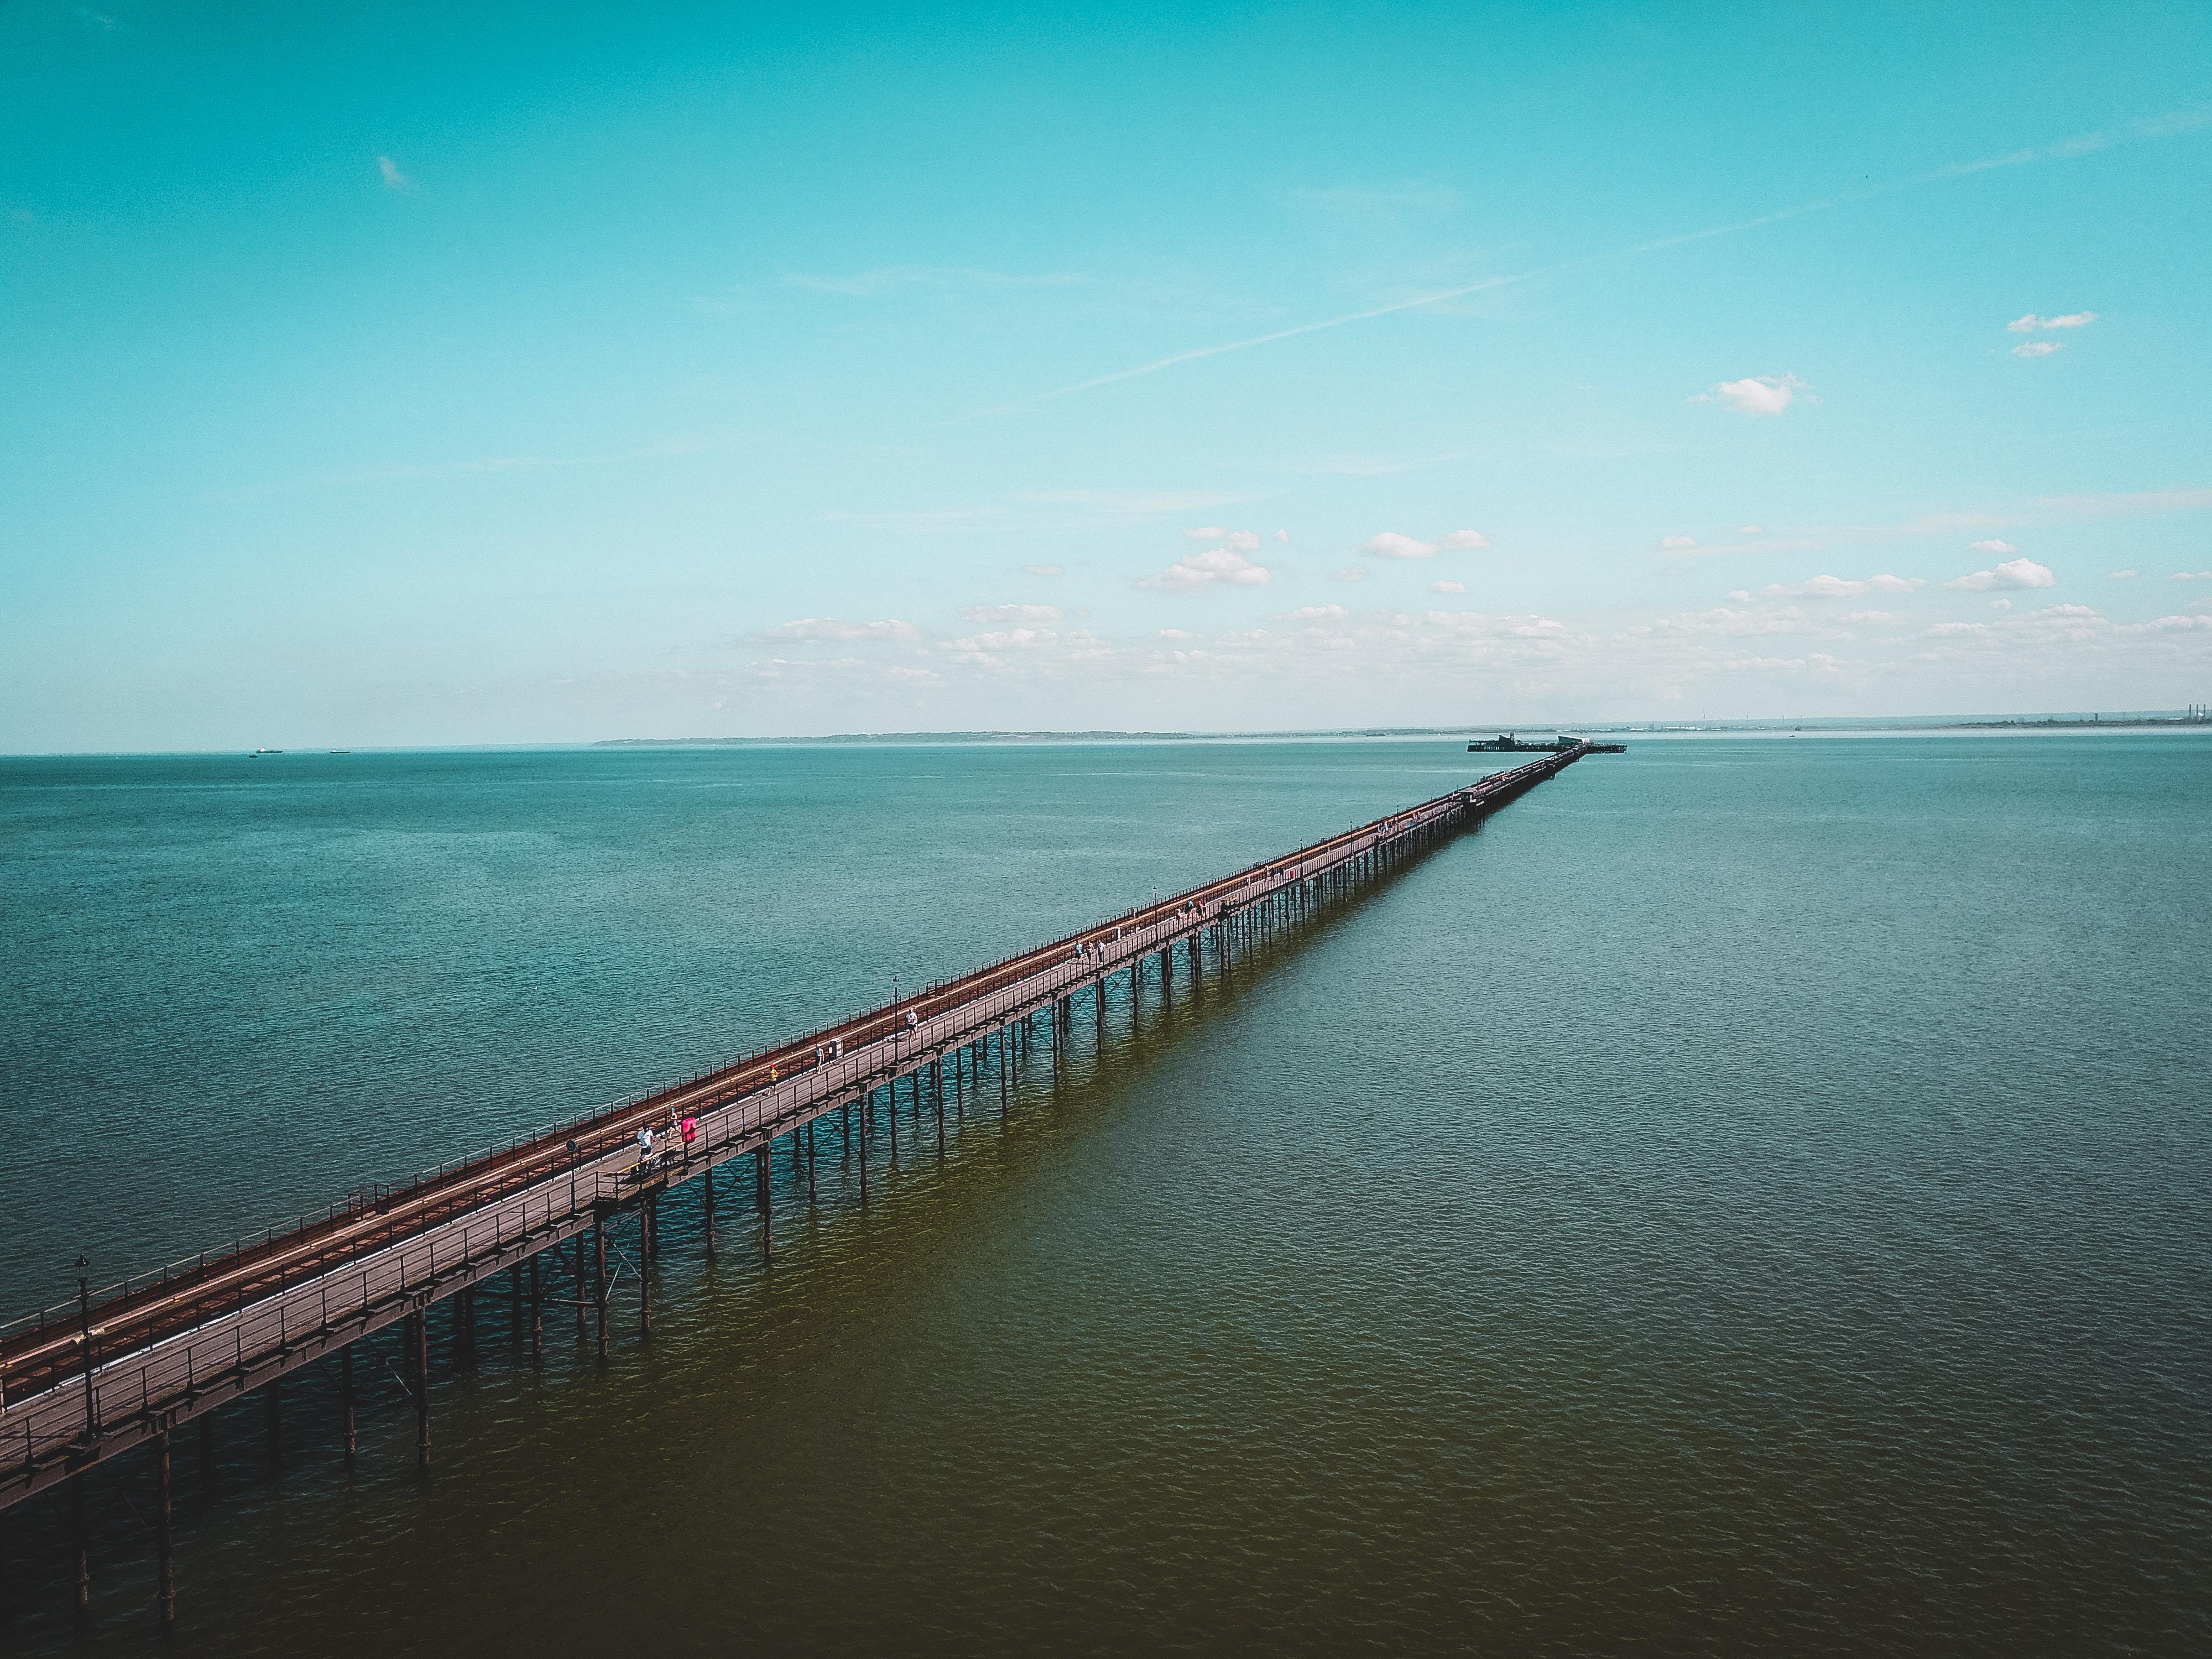 A drone shot of a walking bridge over the bay or ocean